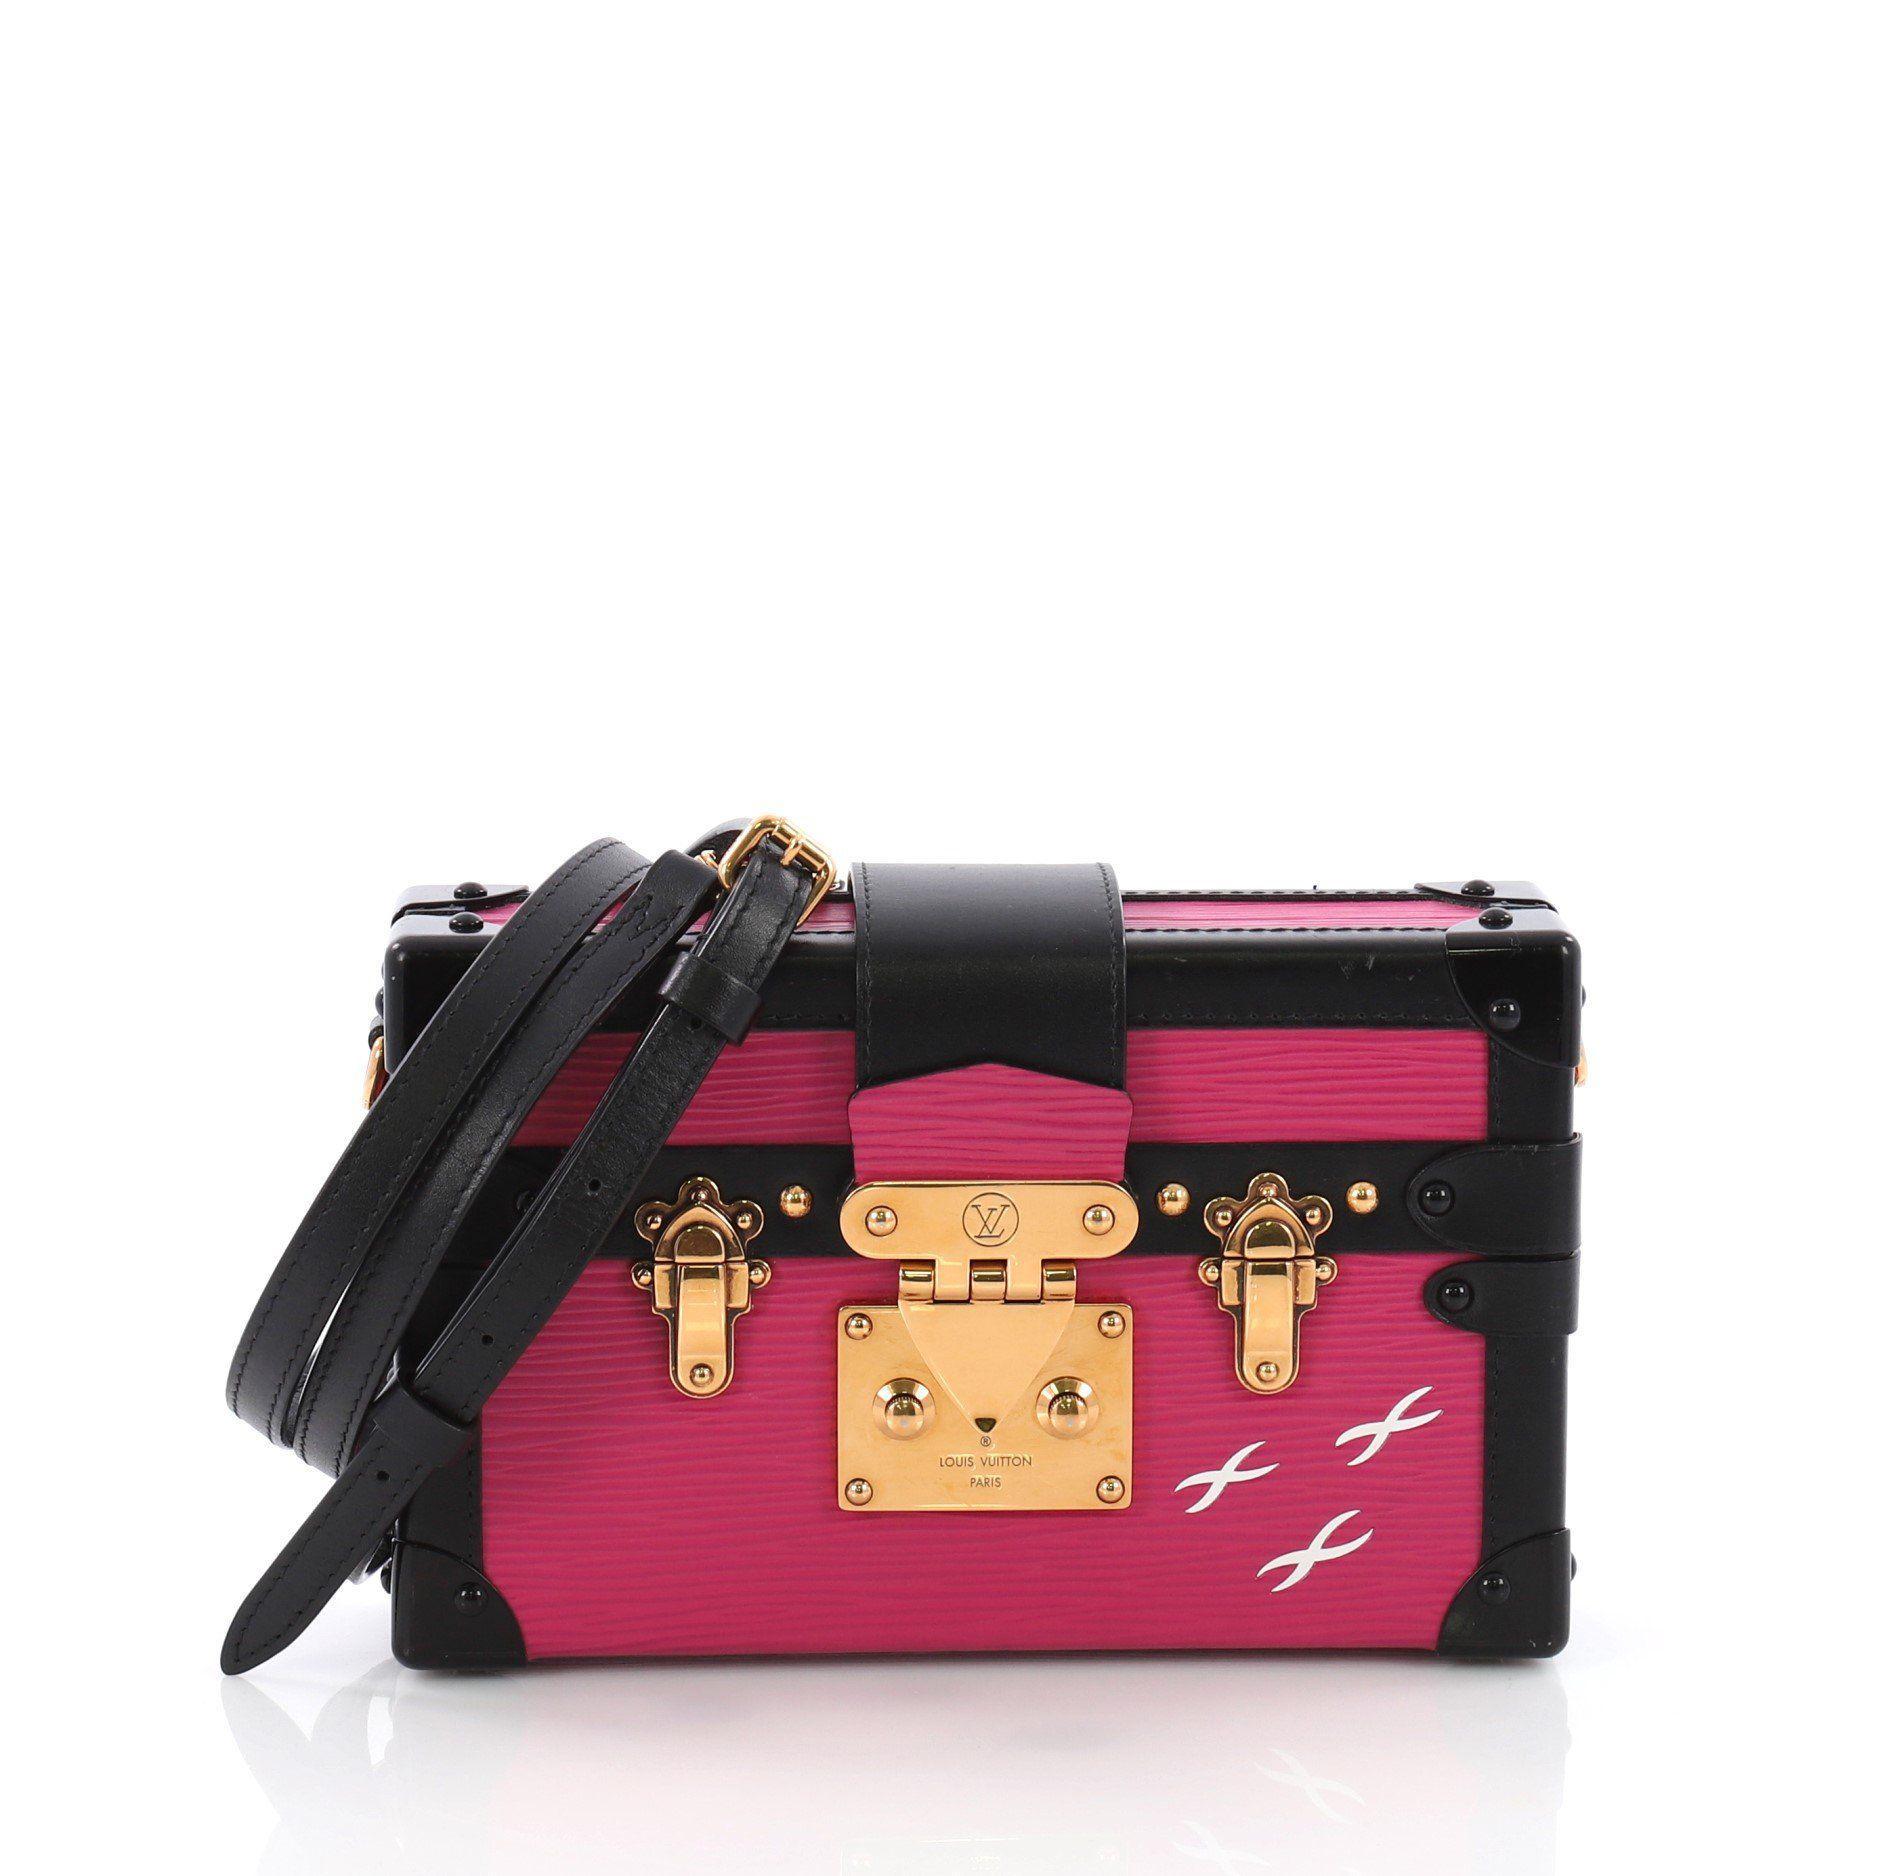 8af9516aeb8e Lyst - Louis Vuitton Pre Owned Petite Malle Handbag Epi Leather